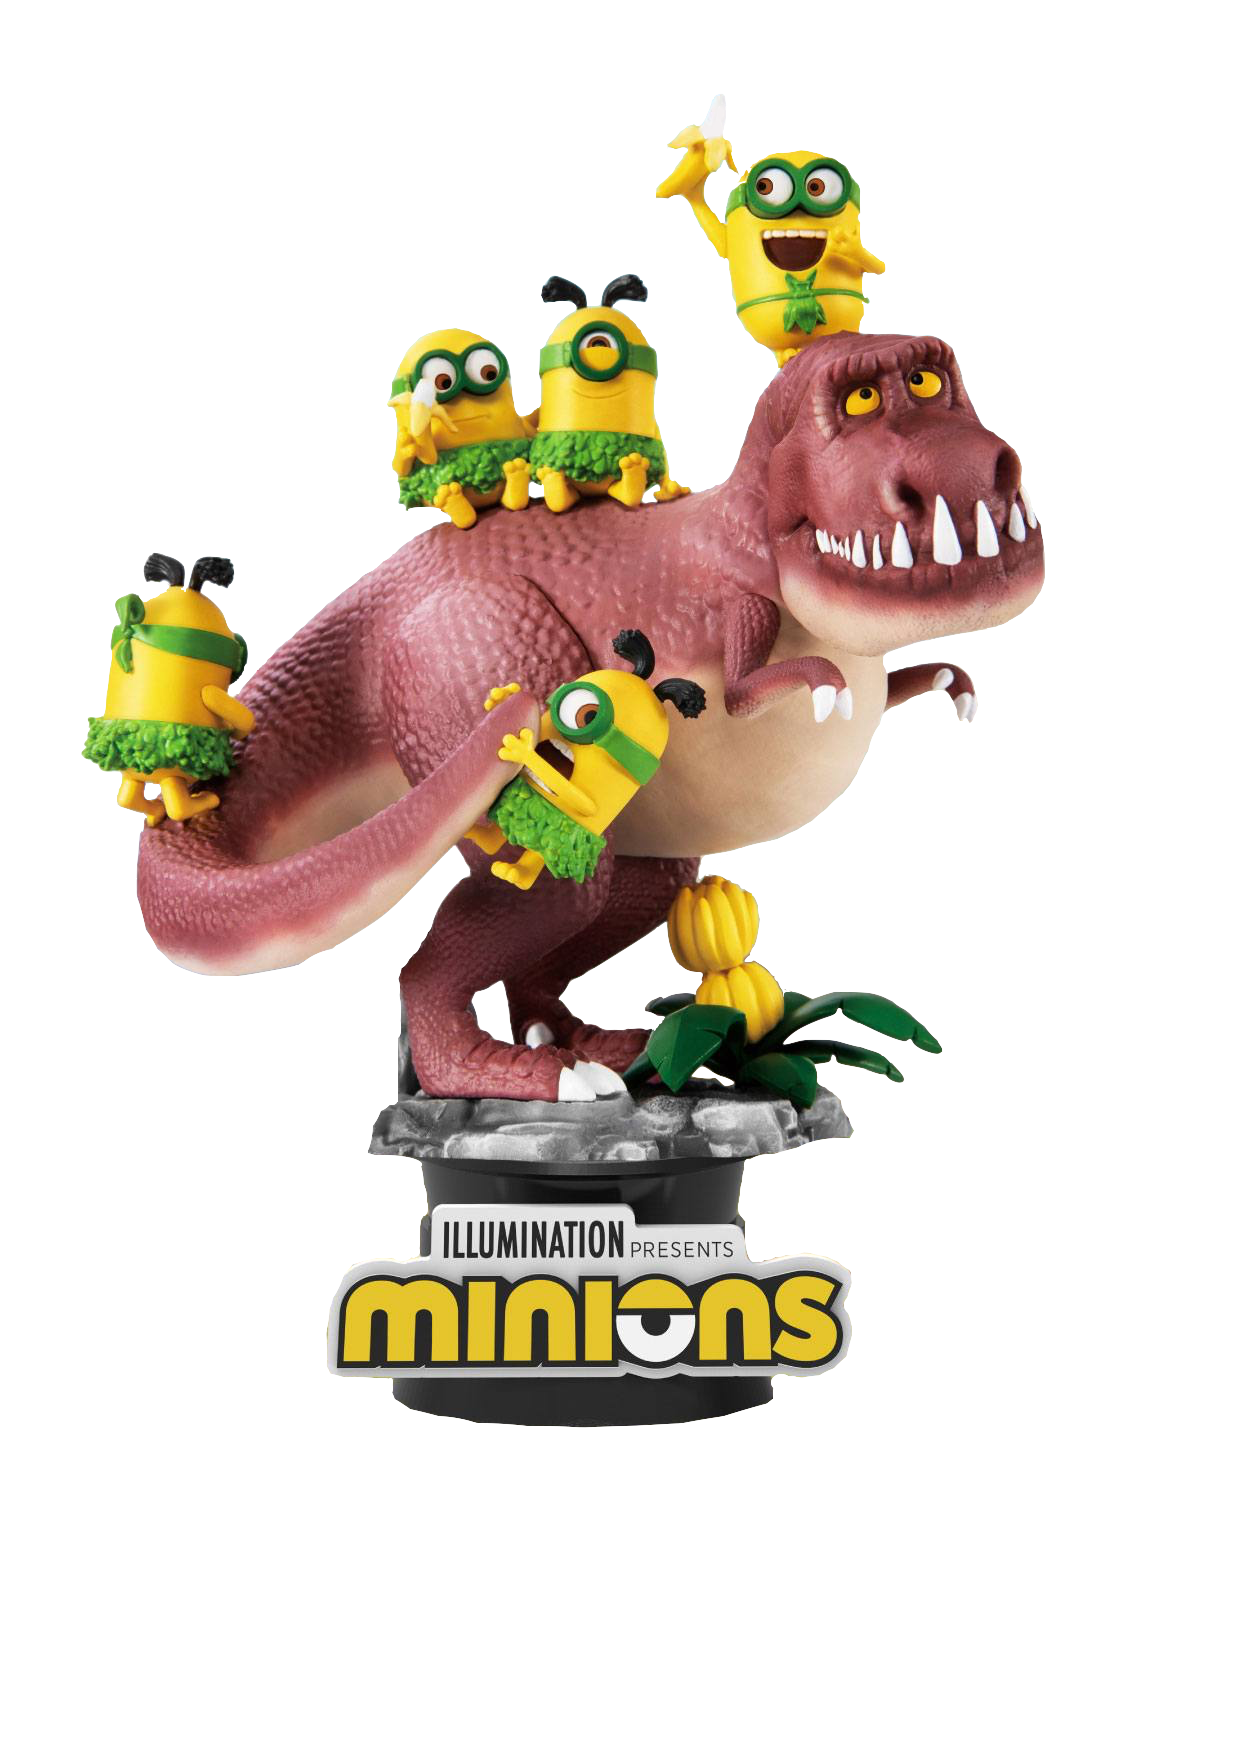 beast-kingdom-toys-minions-prehistoric-pvc-diorama-toyslife